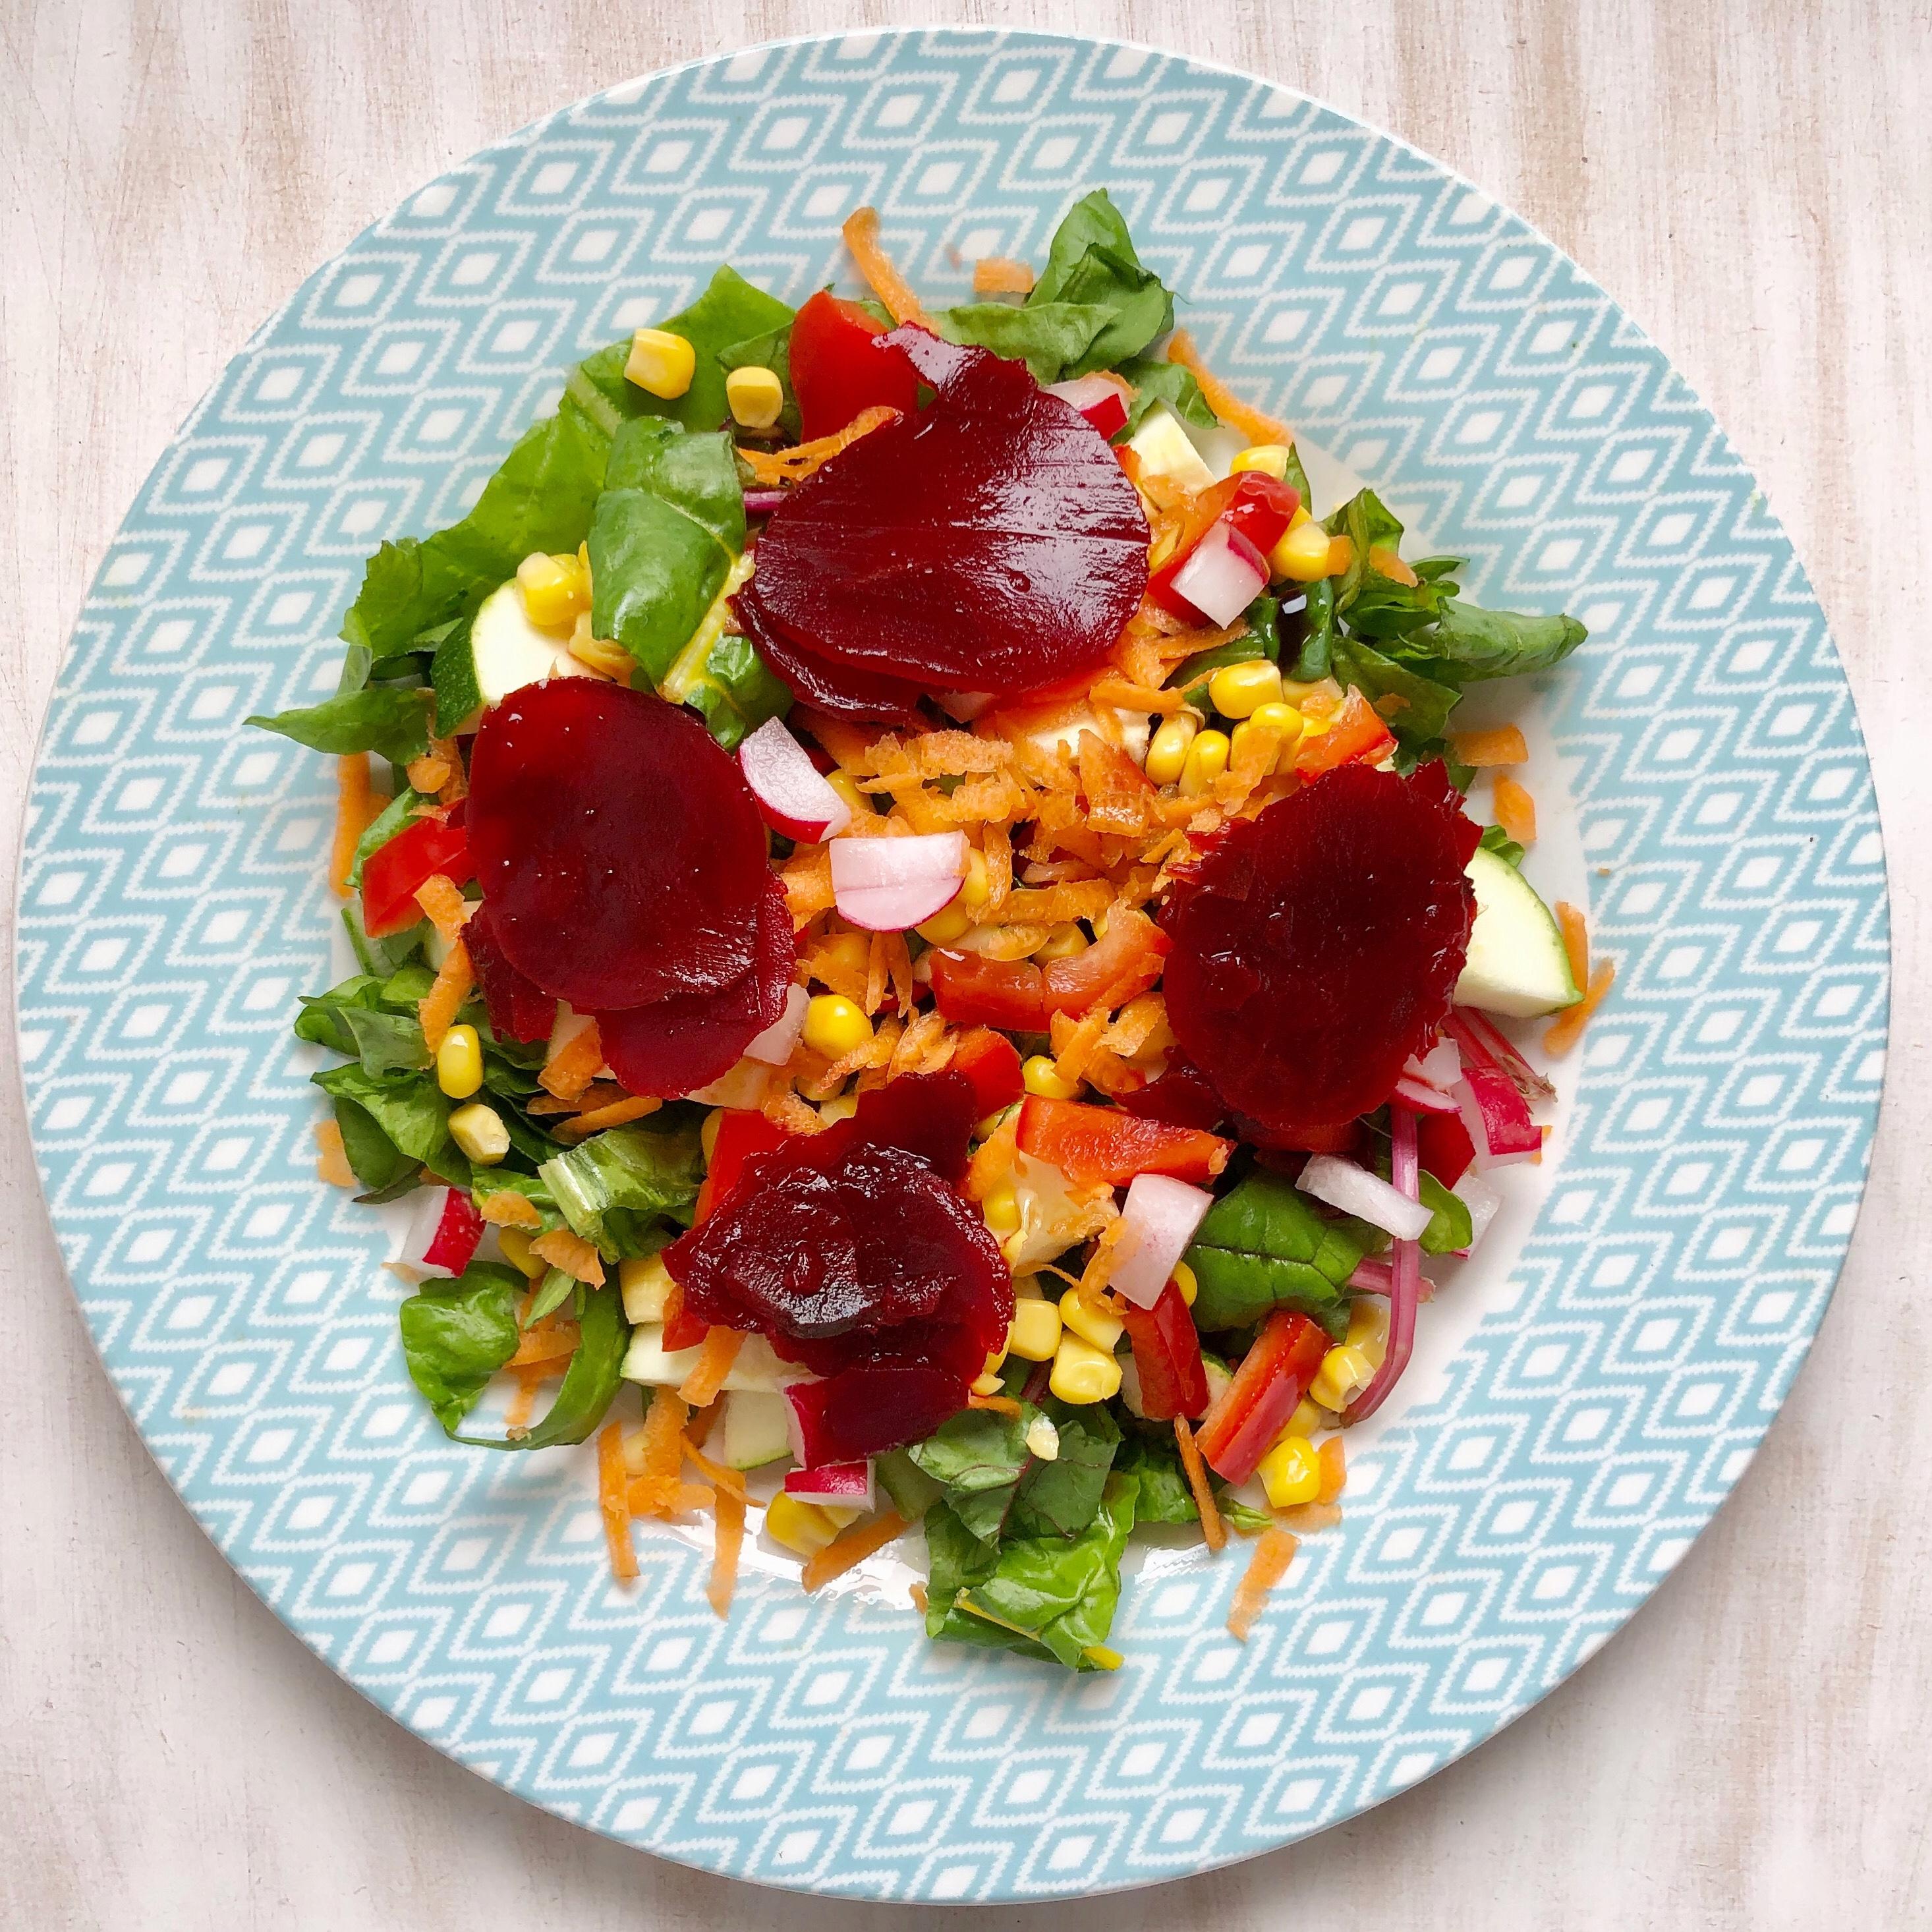 Beetroot & balsamic salad